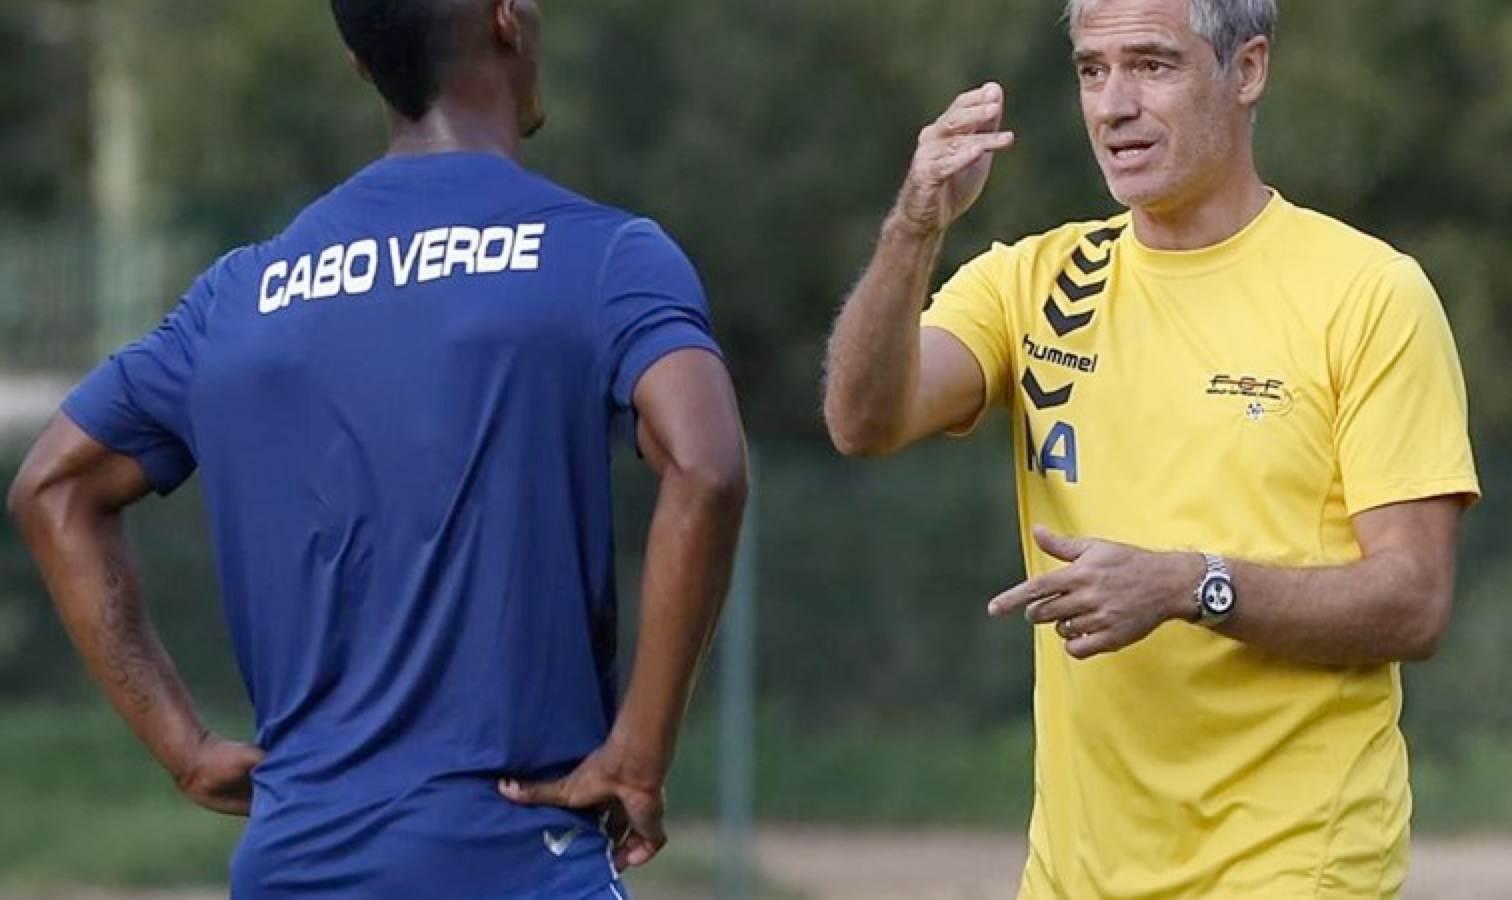 Rui Aguas cap vert coach